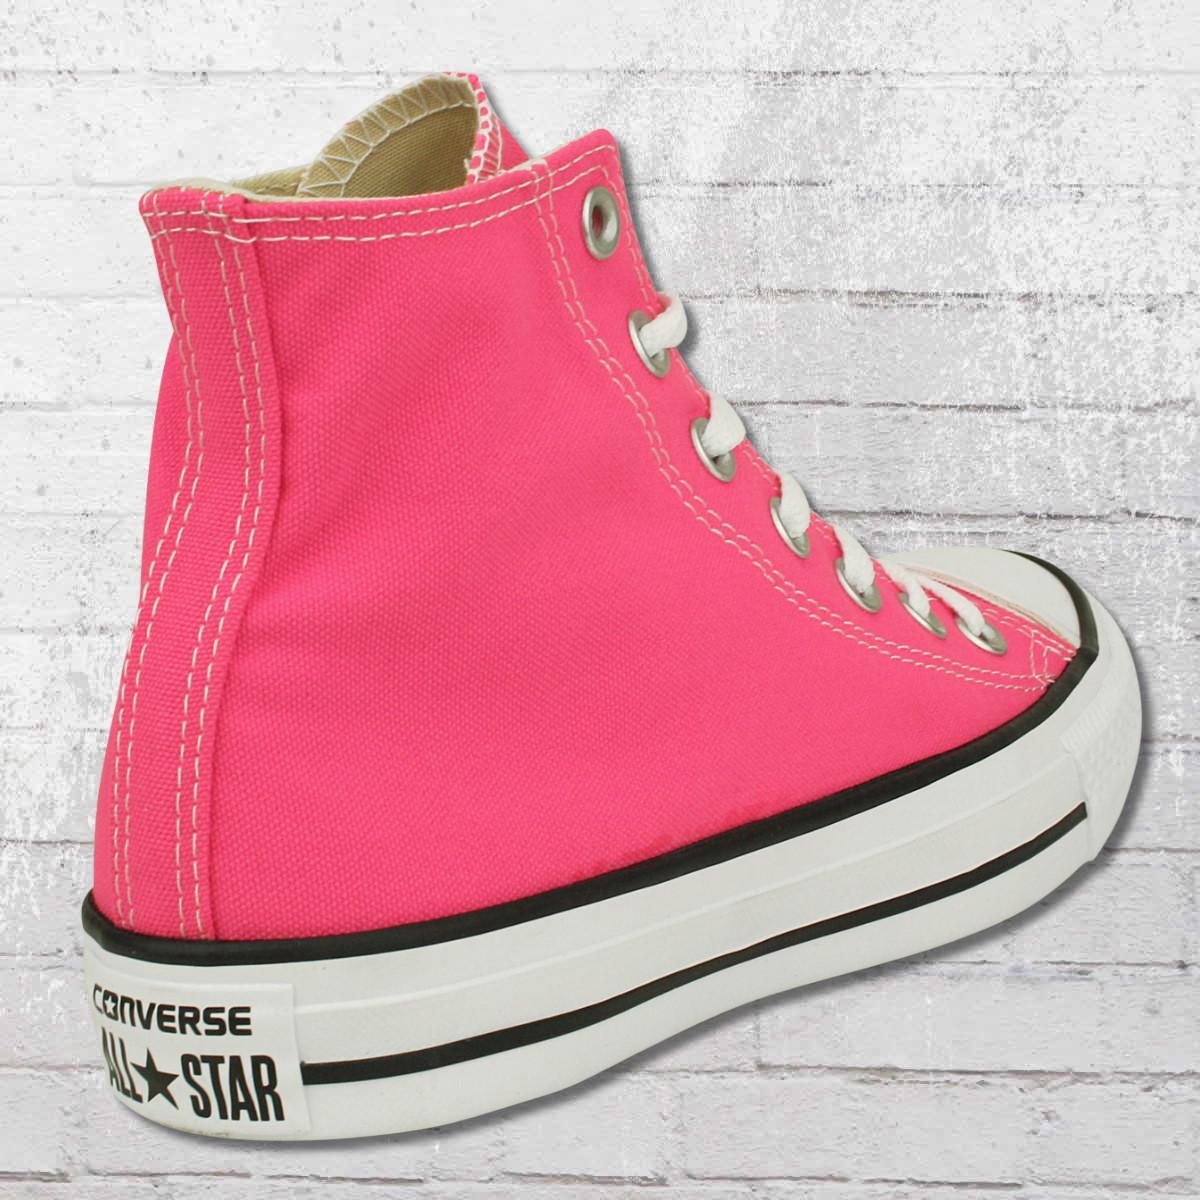 b95e801f4c3e Have you seen  Converse Chucks Shoes ...